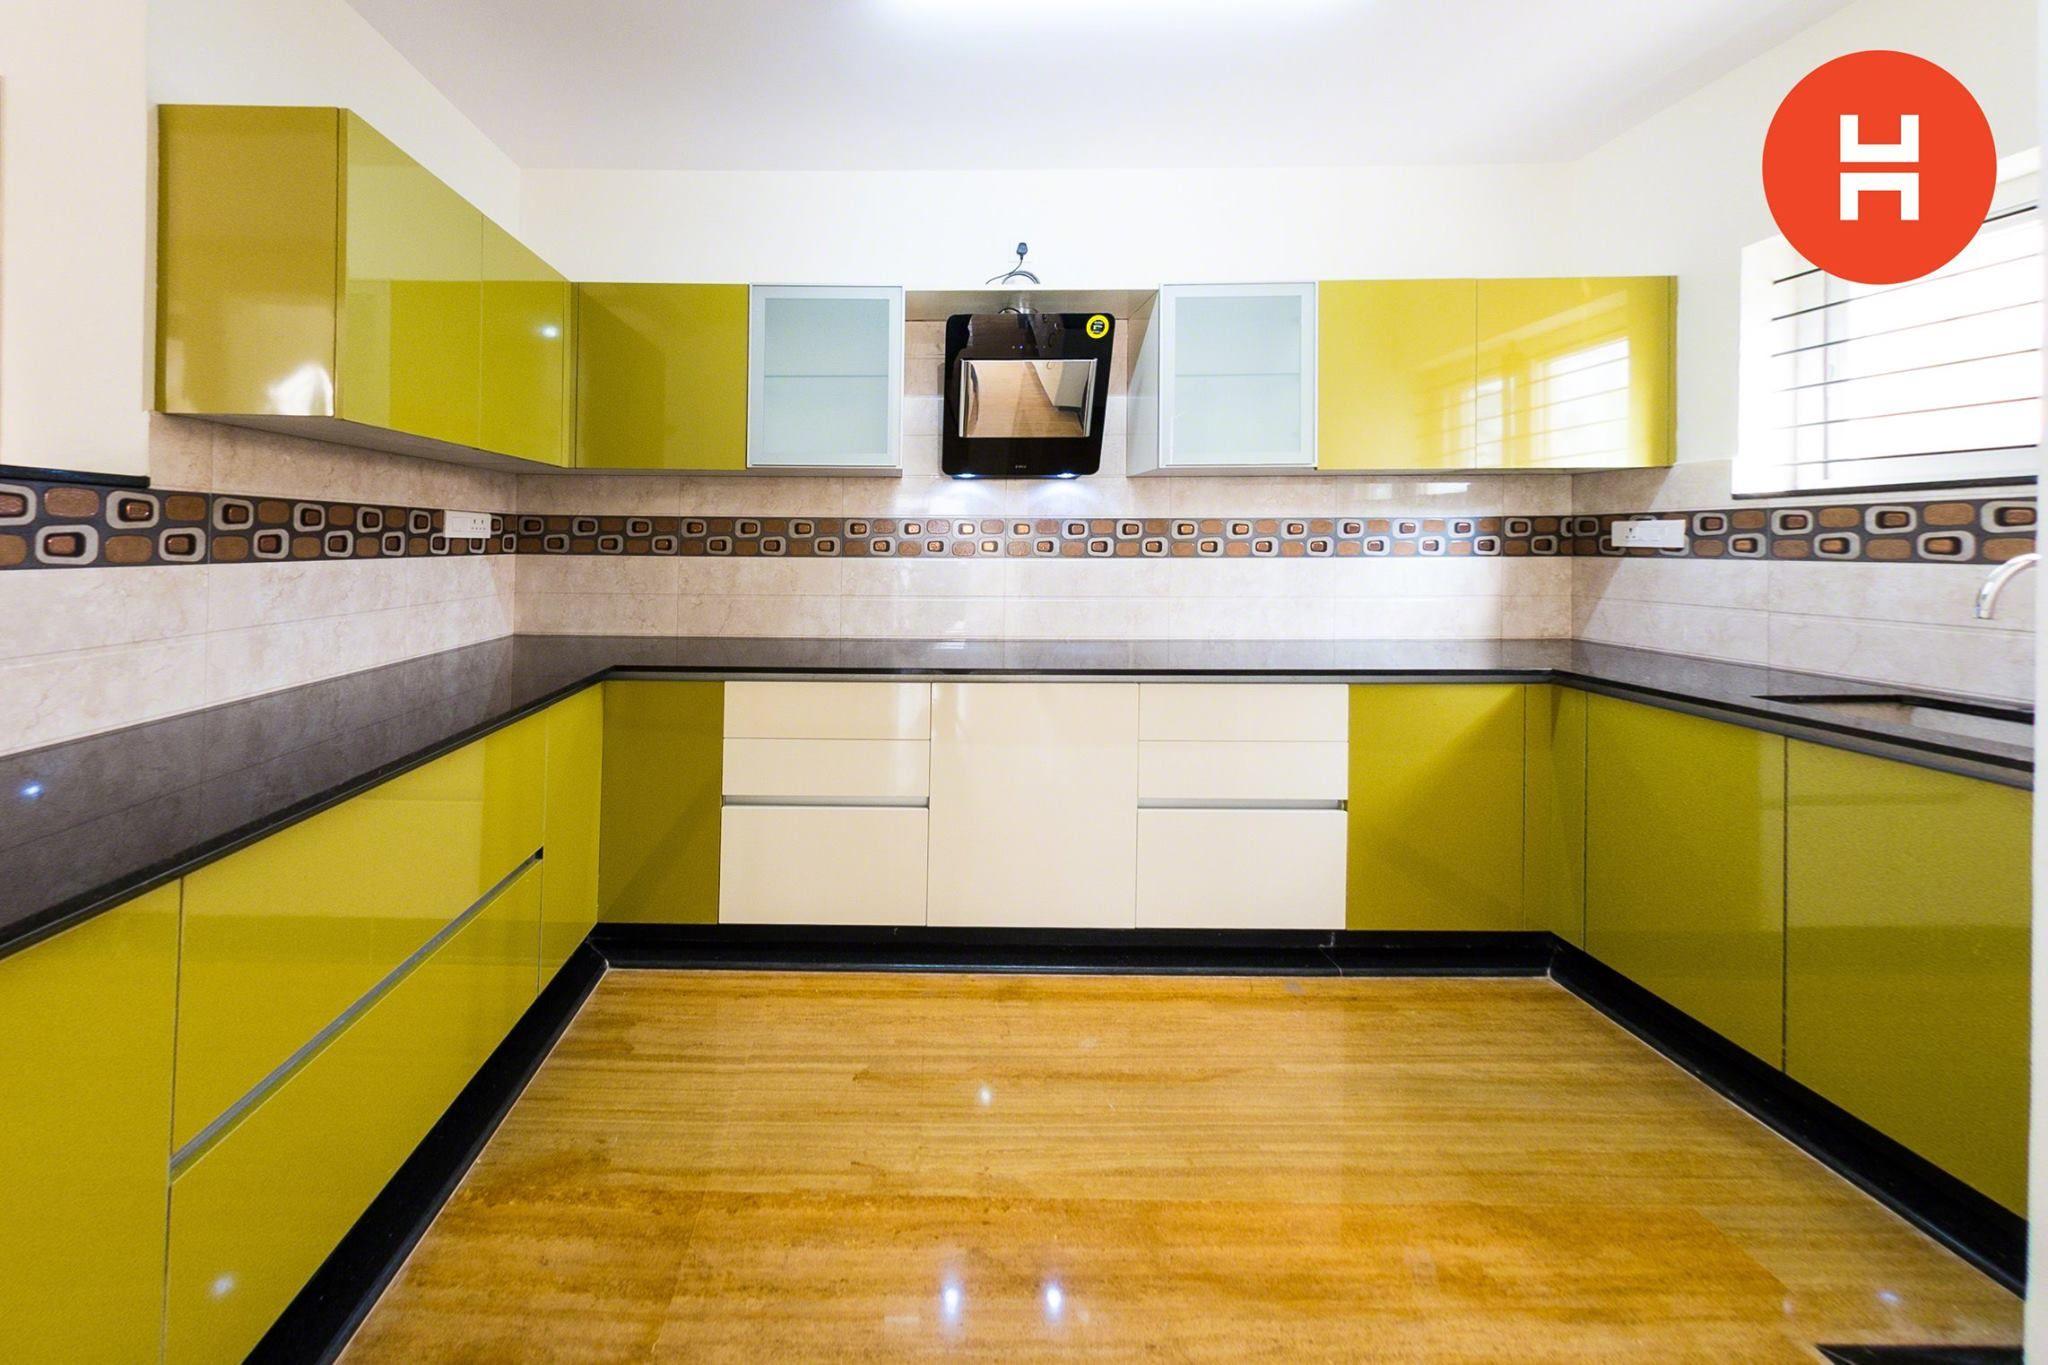 Pin de HomeLane en U-Shaped Modular Kitchens | Pinterest | Intereses ...